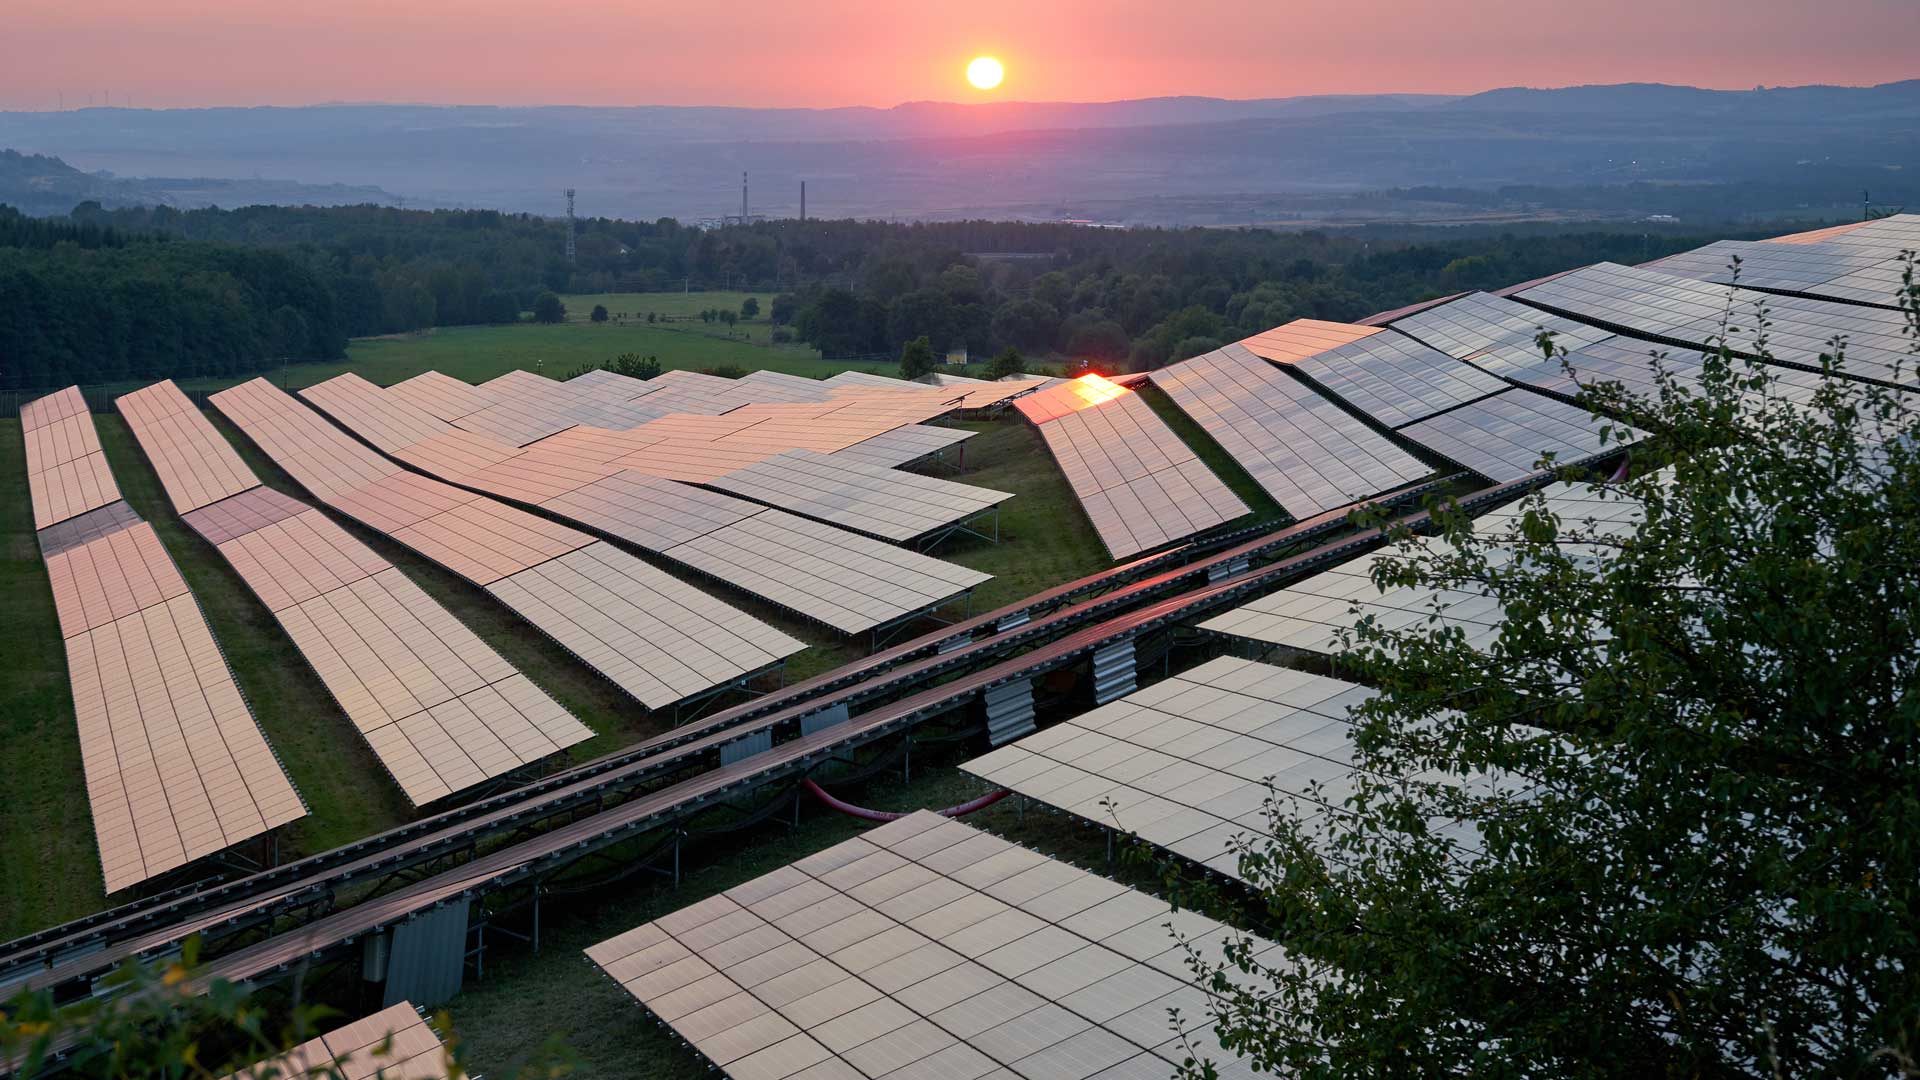 Il Ghana scommette sulle energie rinnovabili